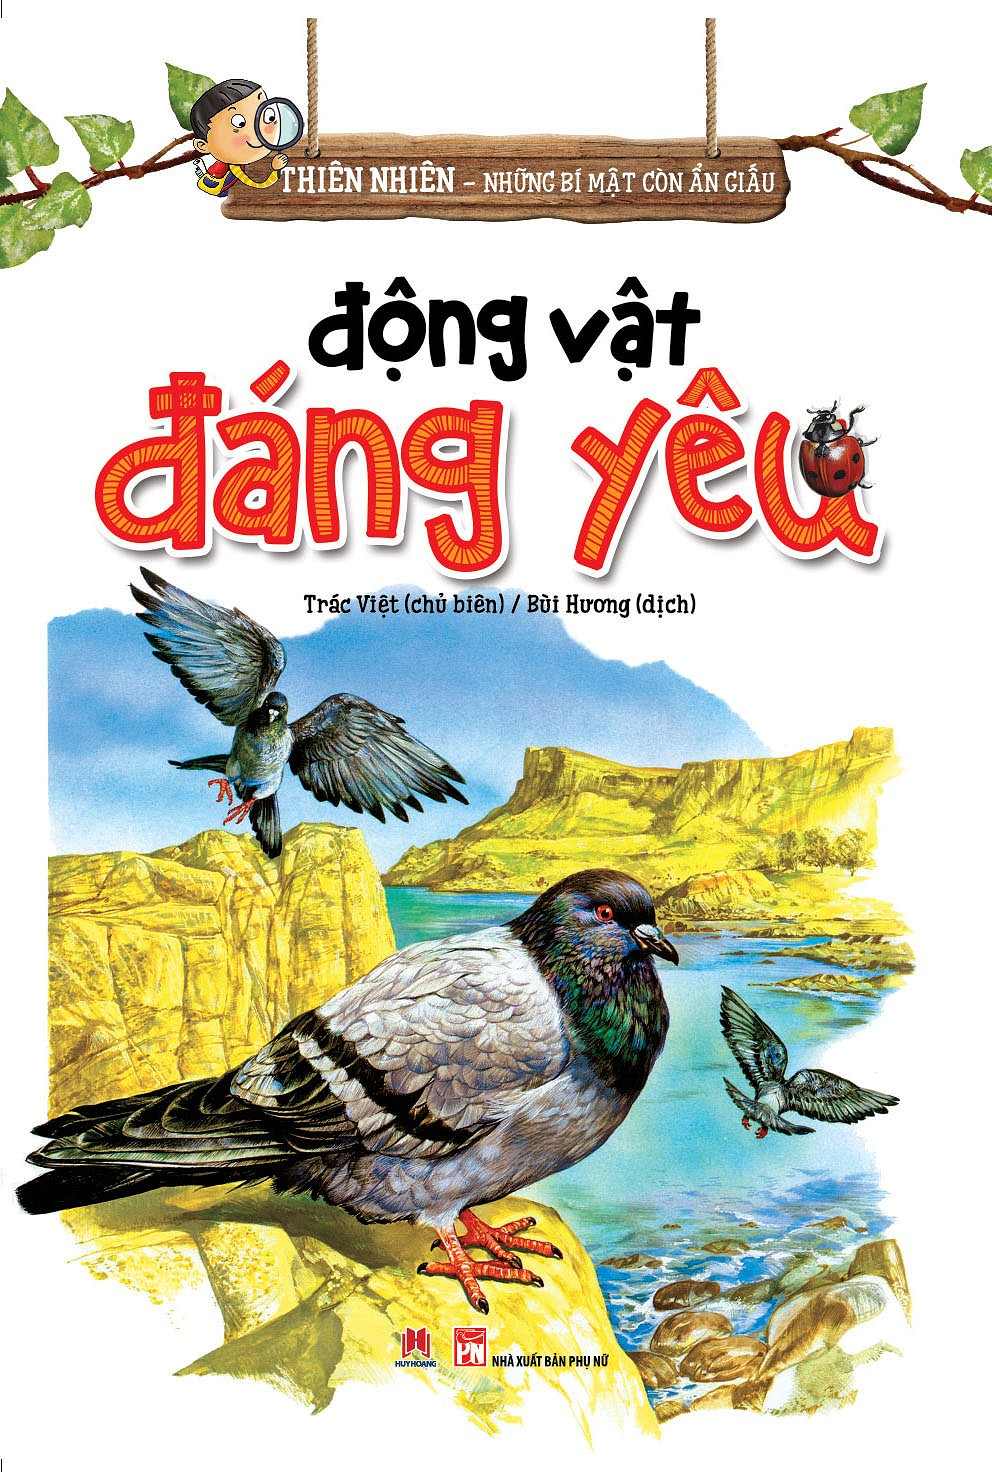 dong-vat-dang-yeu.u2469.d20170110.t142301.245514.jpg